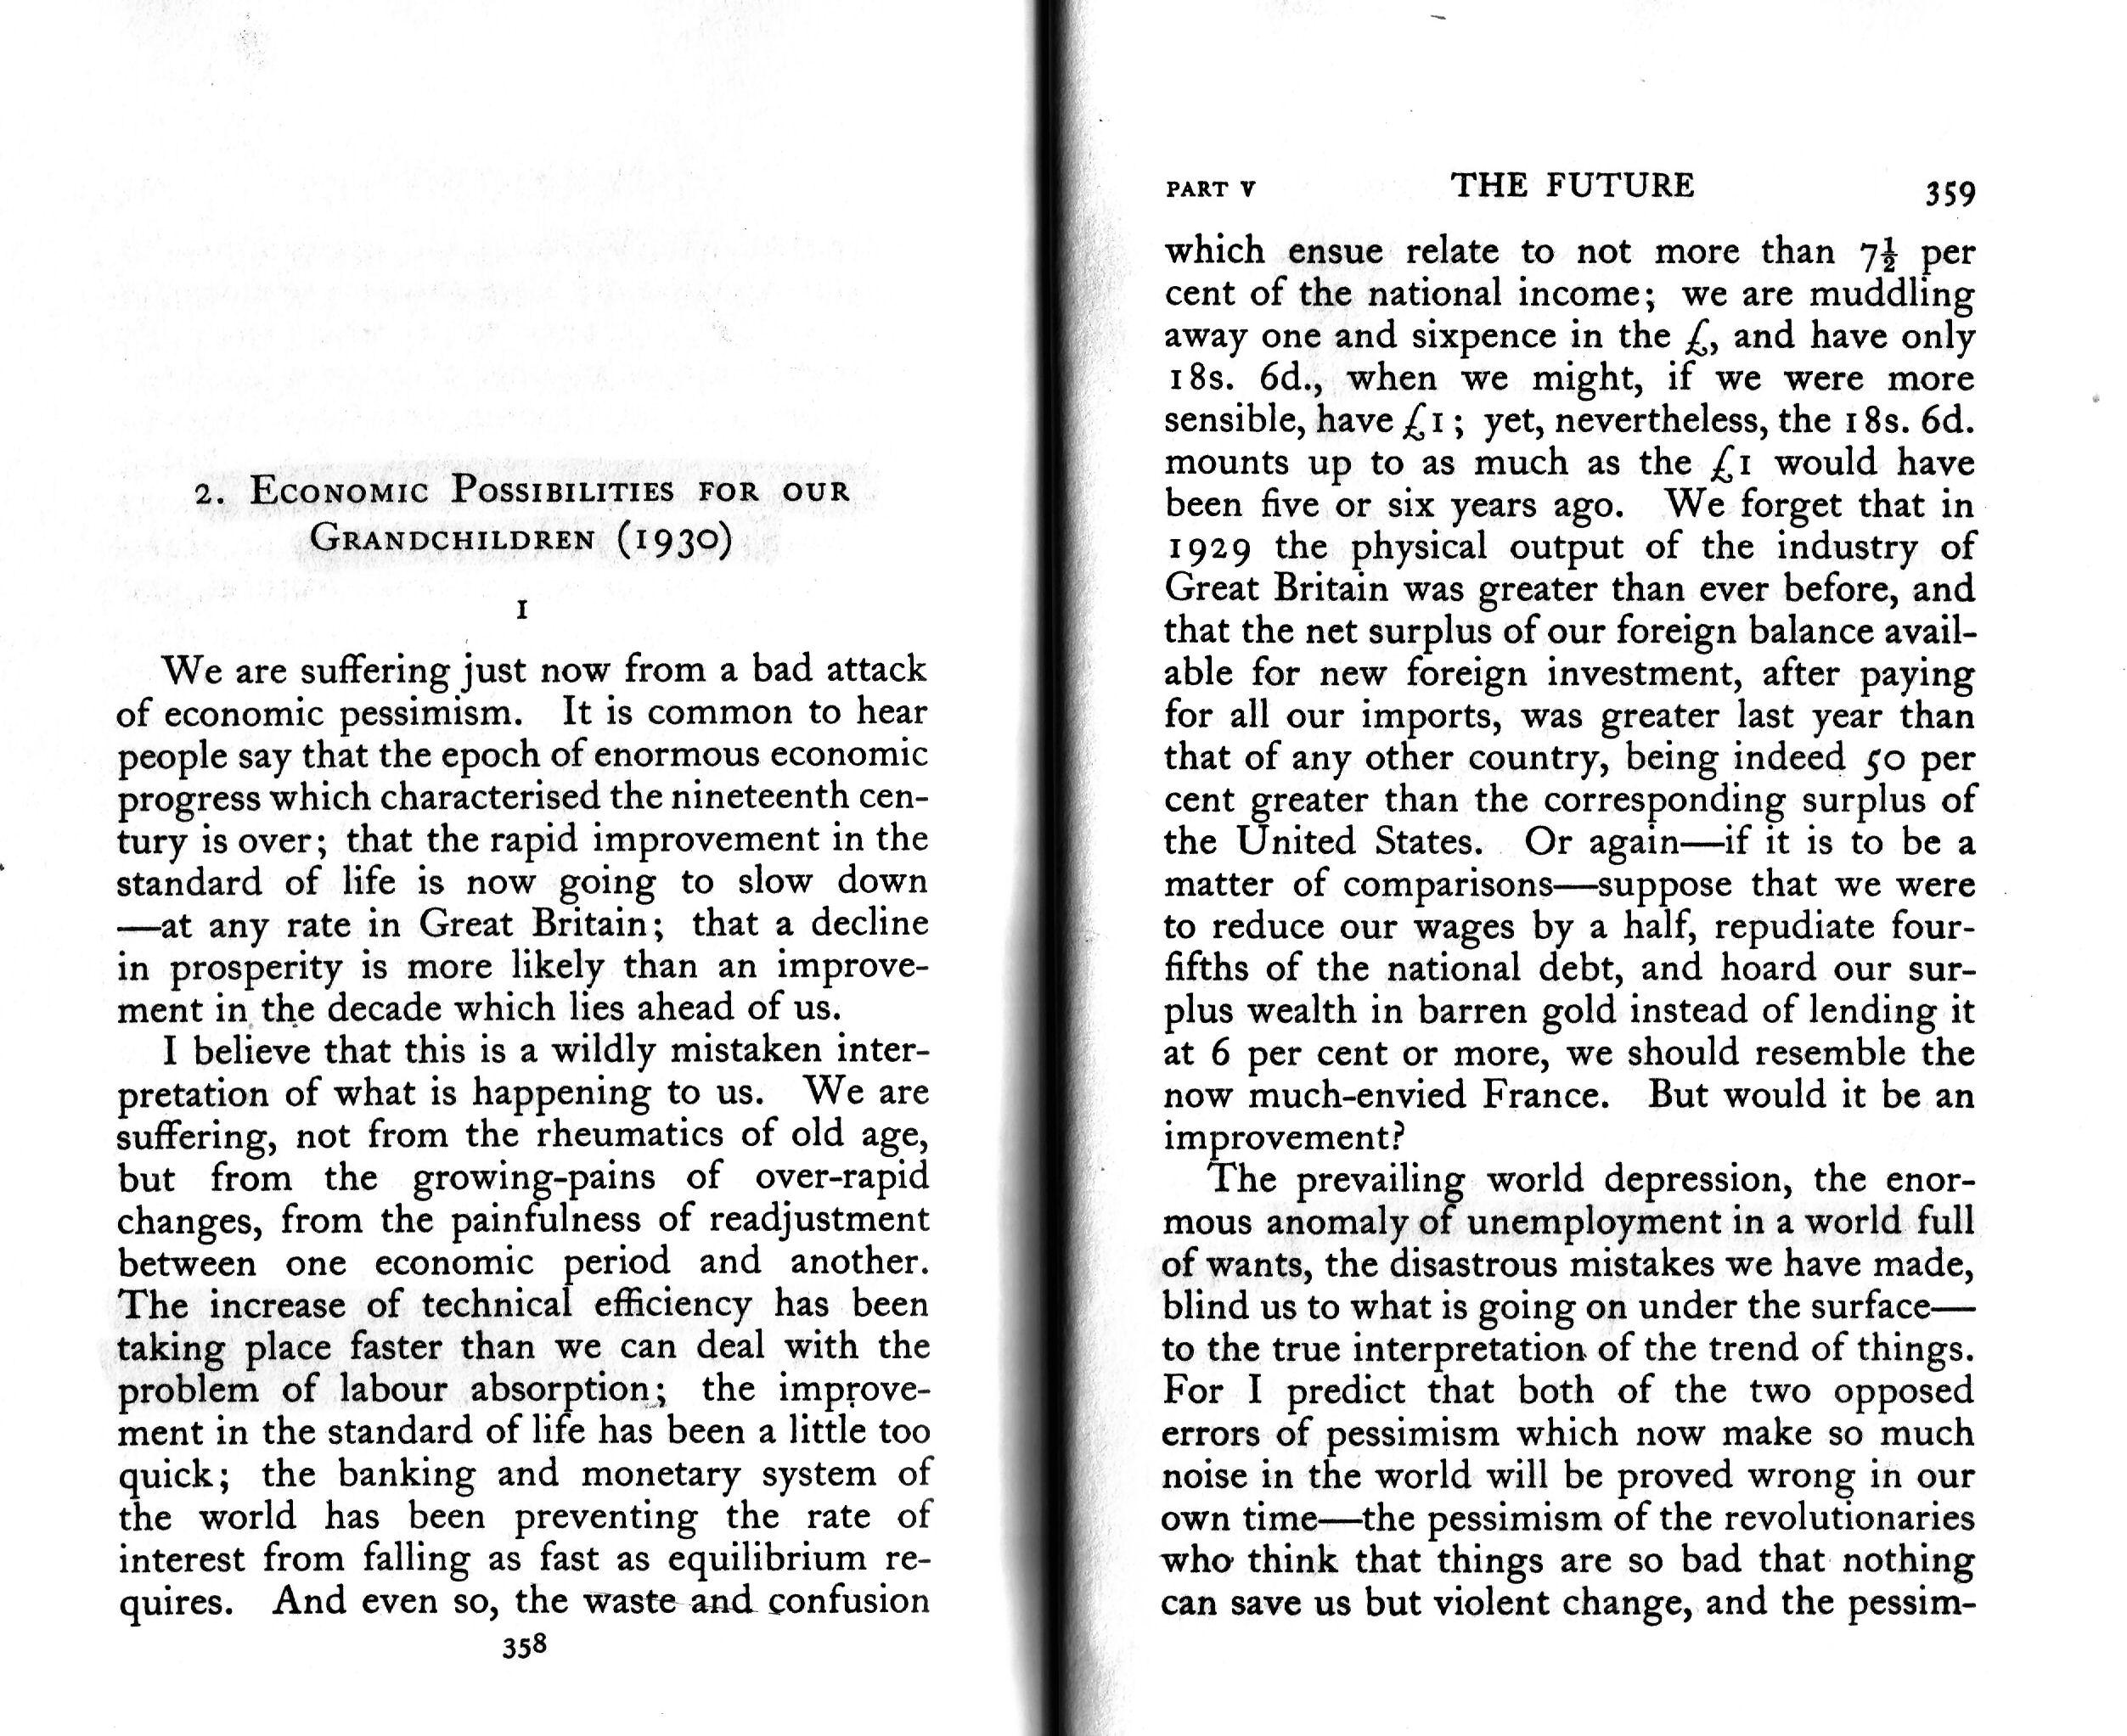 005 Essays In Persuasion Essay Remarkable Audiobook Pdf John Maynard Keynes Summary Full